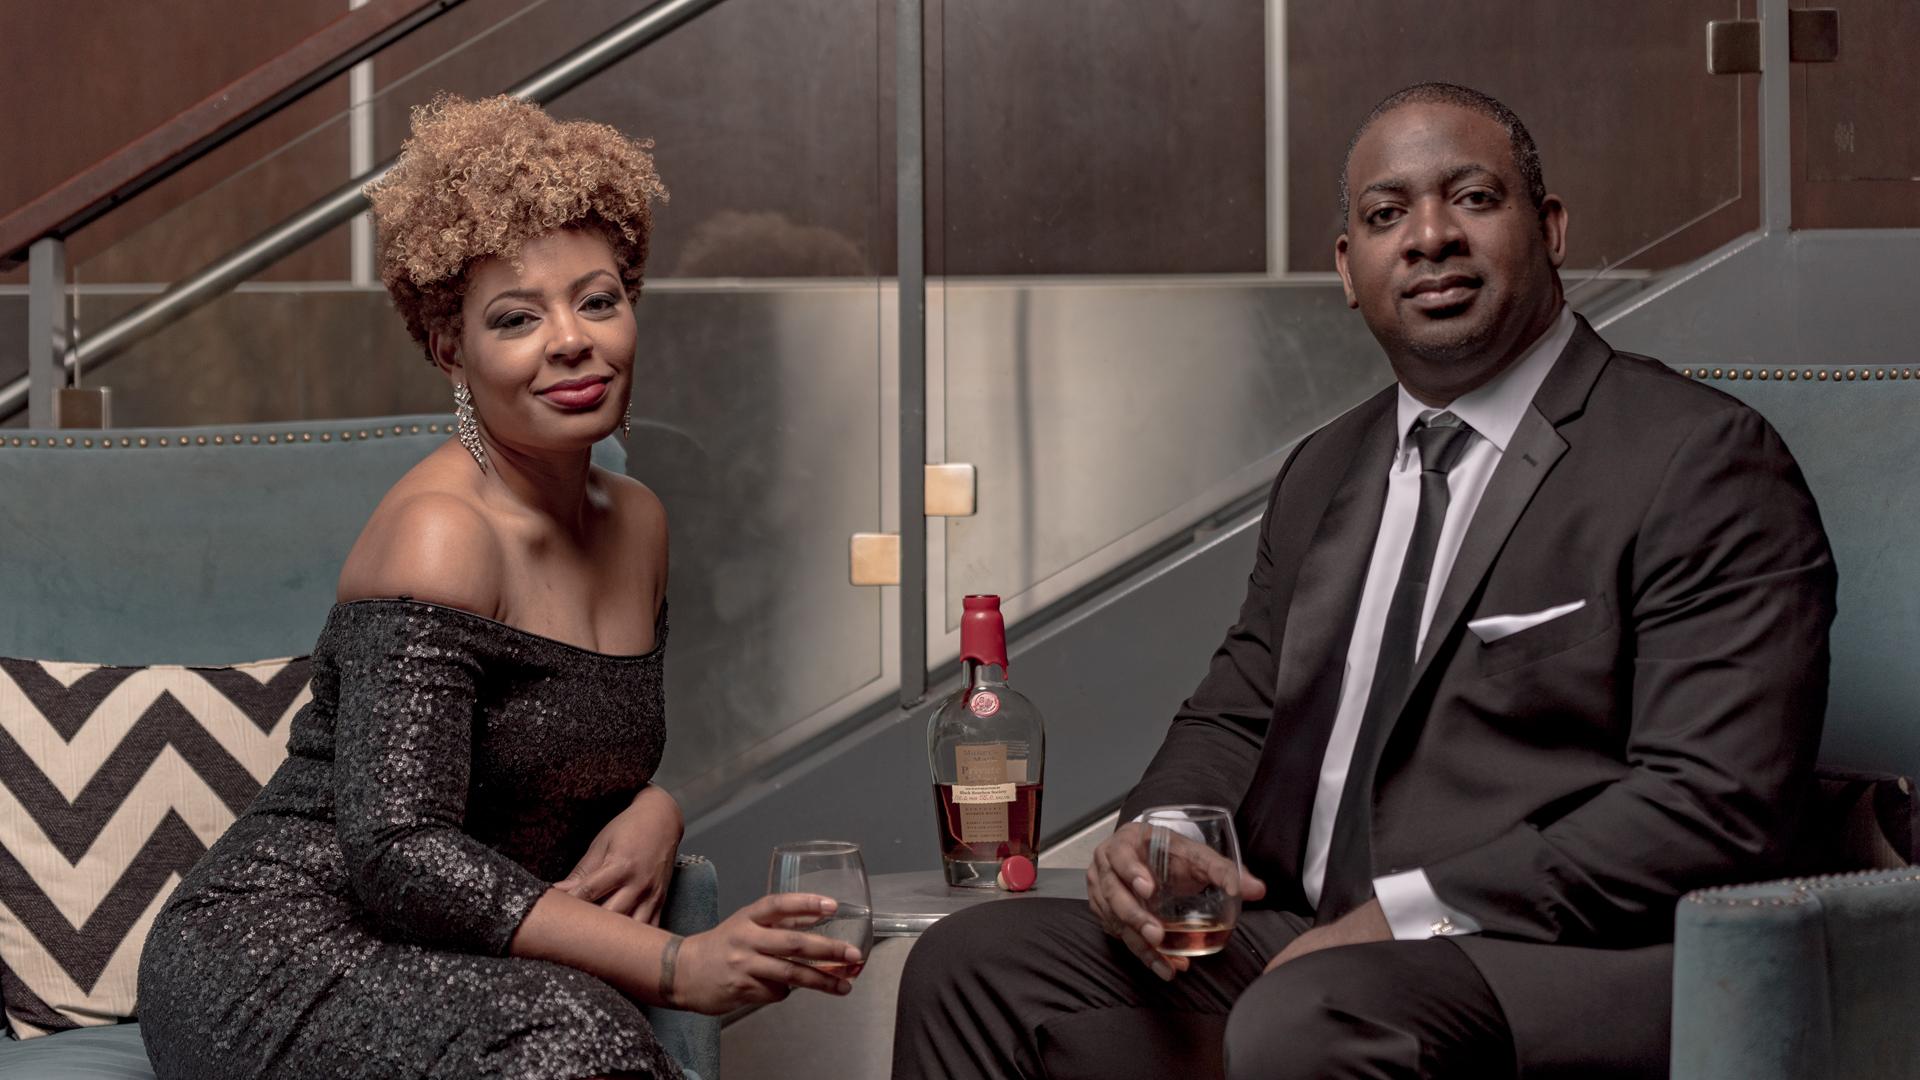 The NOLADrinks Show – Black Bourbon Society and Diversity Distilled – Dec20Ep4 – Samara Davis and Armond Davis of the Black Bourbon Society and Diversity Distilled.